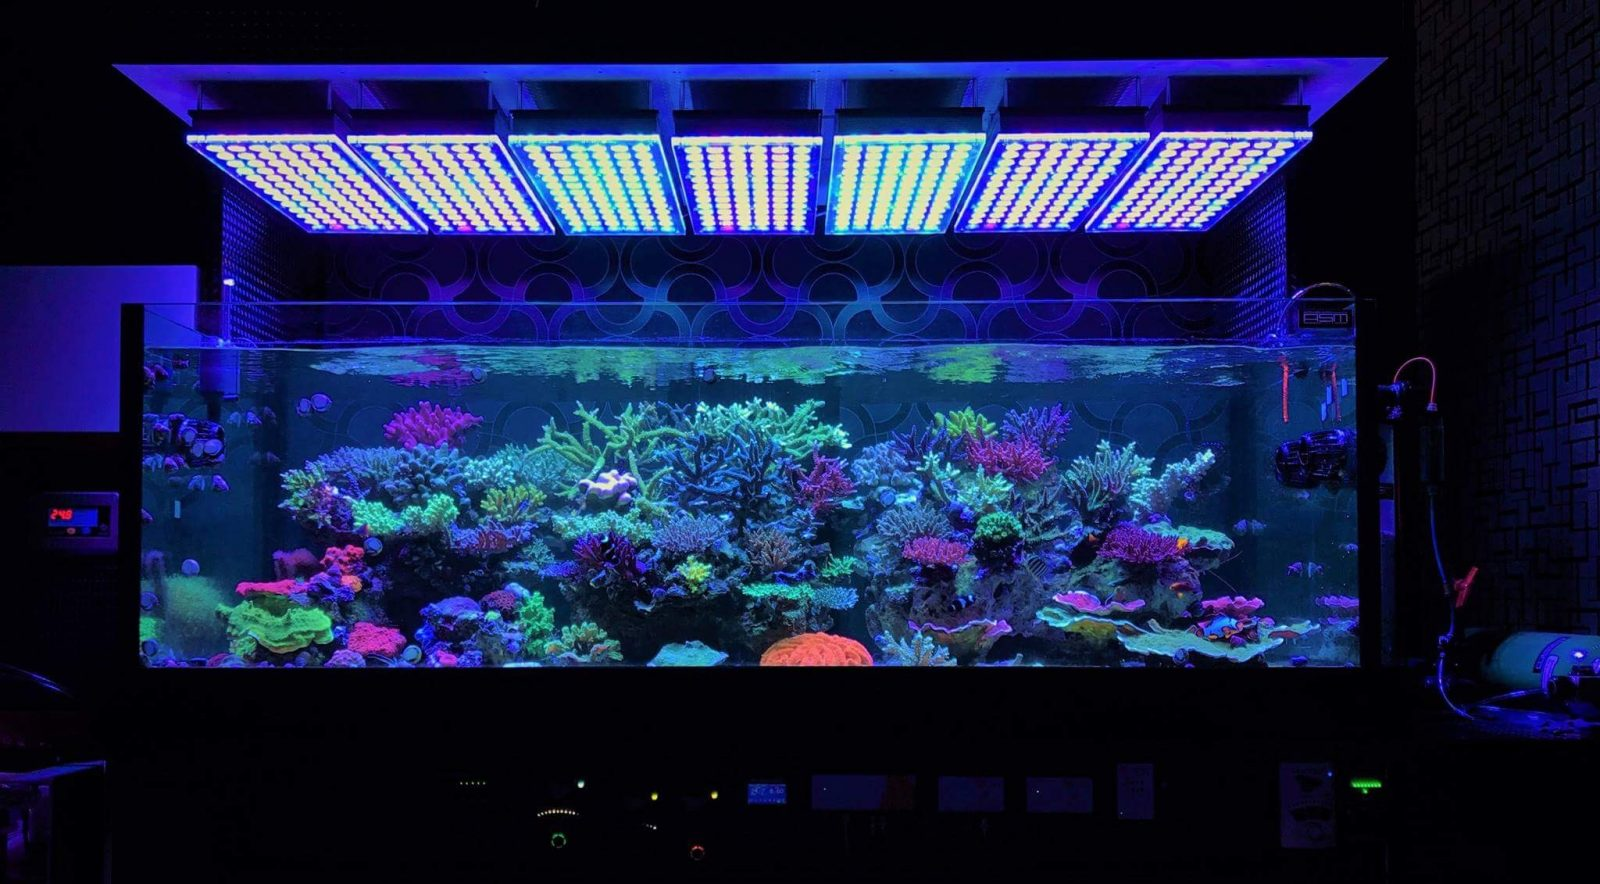 Erstaunlicher Japanischer Riff Tank Unter Atlantik V4 Led Beleuchtung Orphek